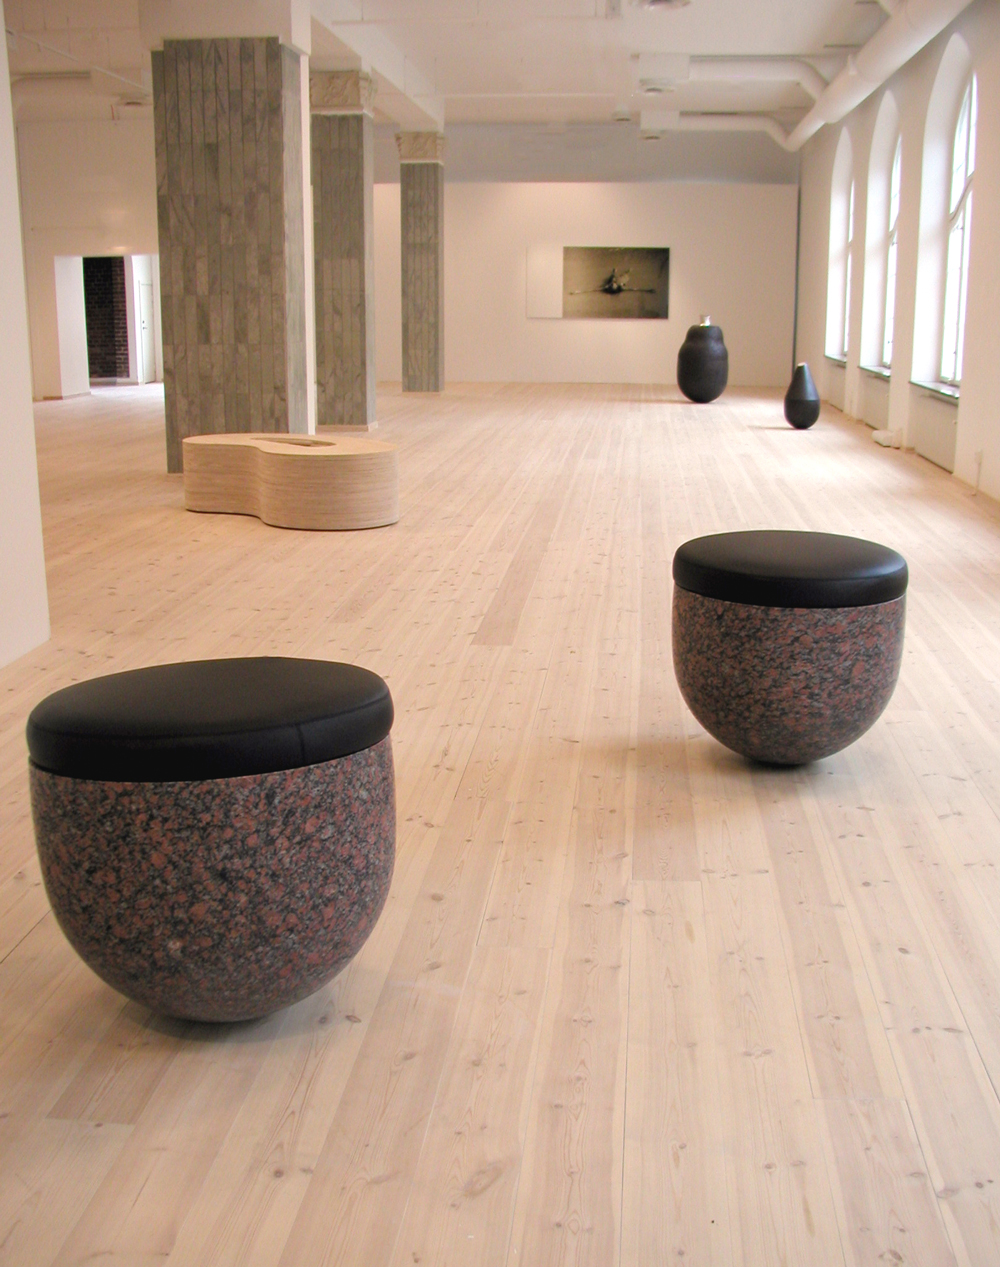 Pre Ooze, Kristianstads konsthall